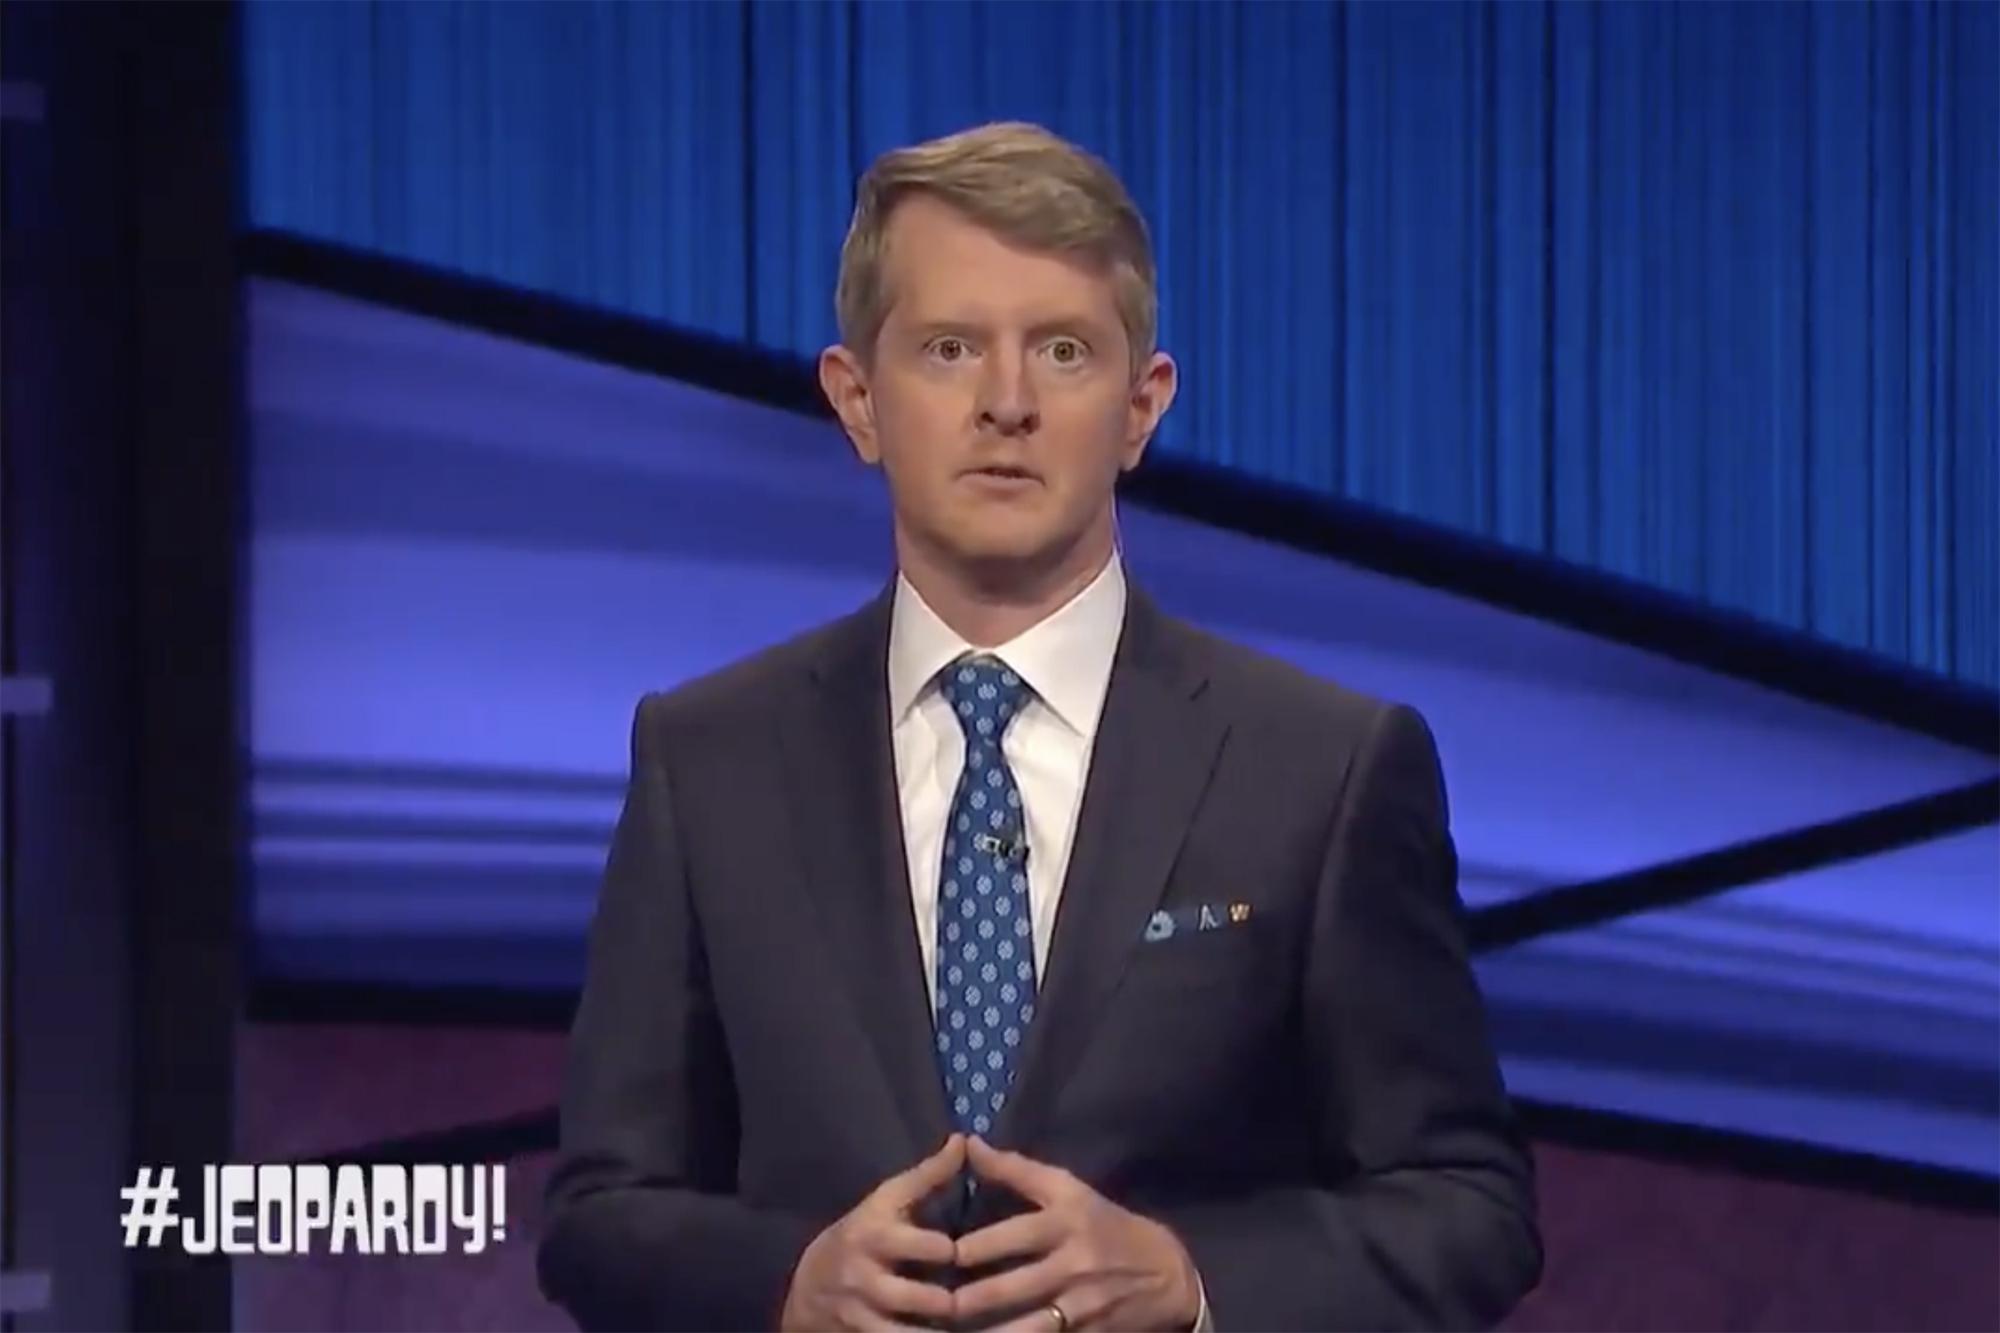 Ken Jennings' hosts first 'Jeopardy!' after Alex Trebek's death